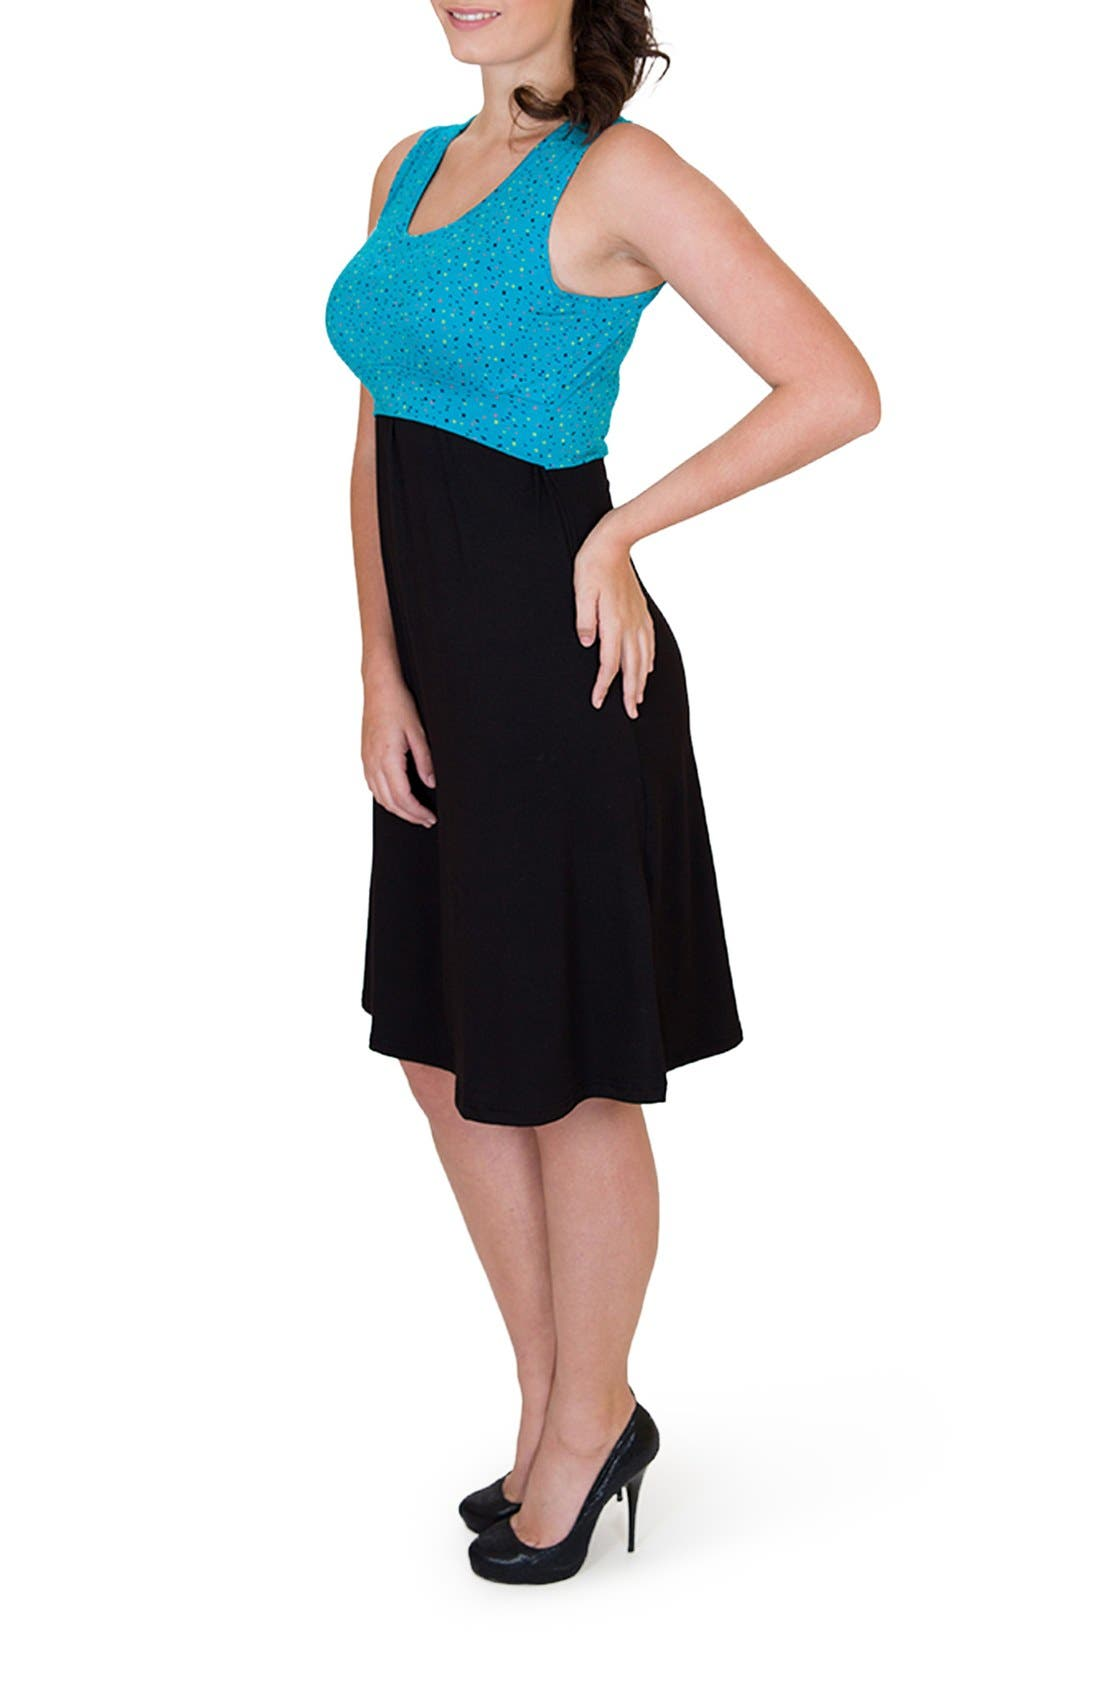 'Ana' Maternity/Nursing Dress,                             Alternate thumbnail 4, color,                             DOTS TOP W/ BLACK SKIRT